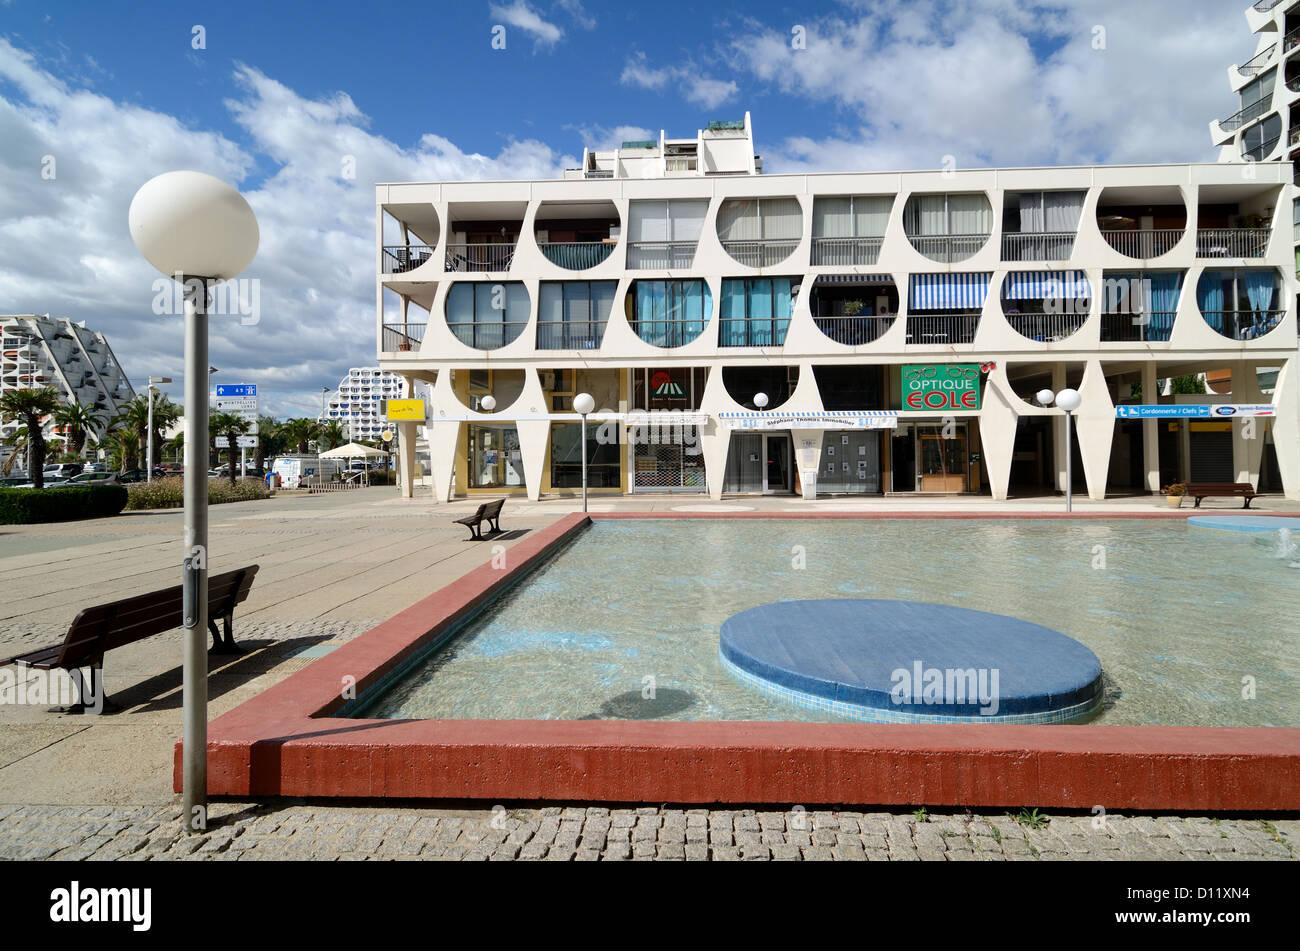 Bâtiment Delta Town Square et bassin ornemental de la Grande-Motte Hérault France Banque D'Images